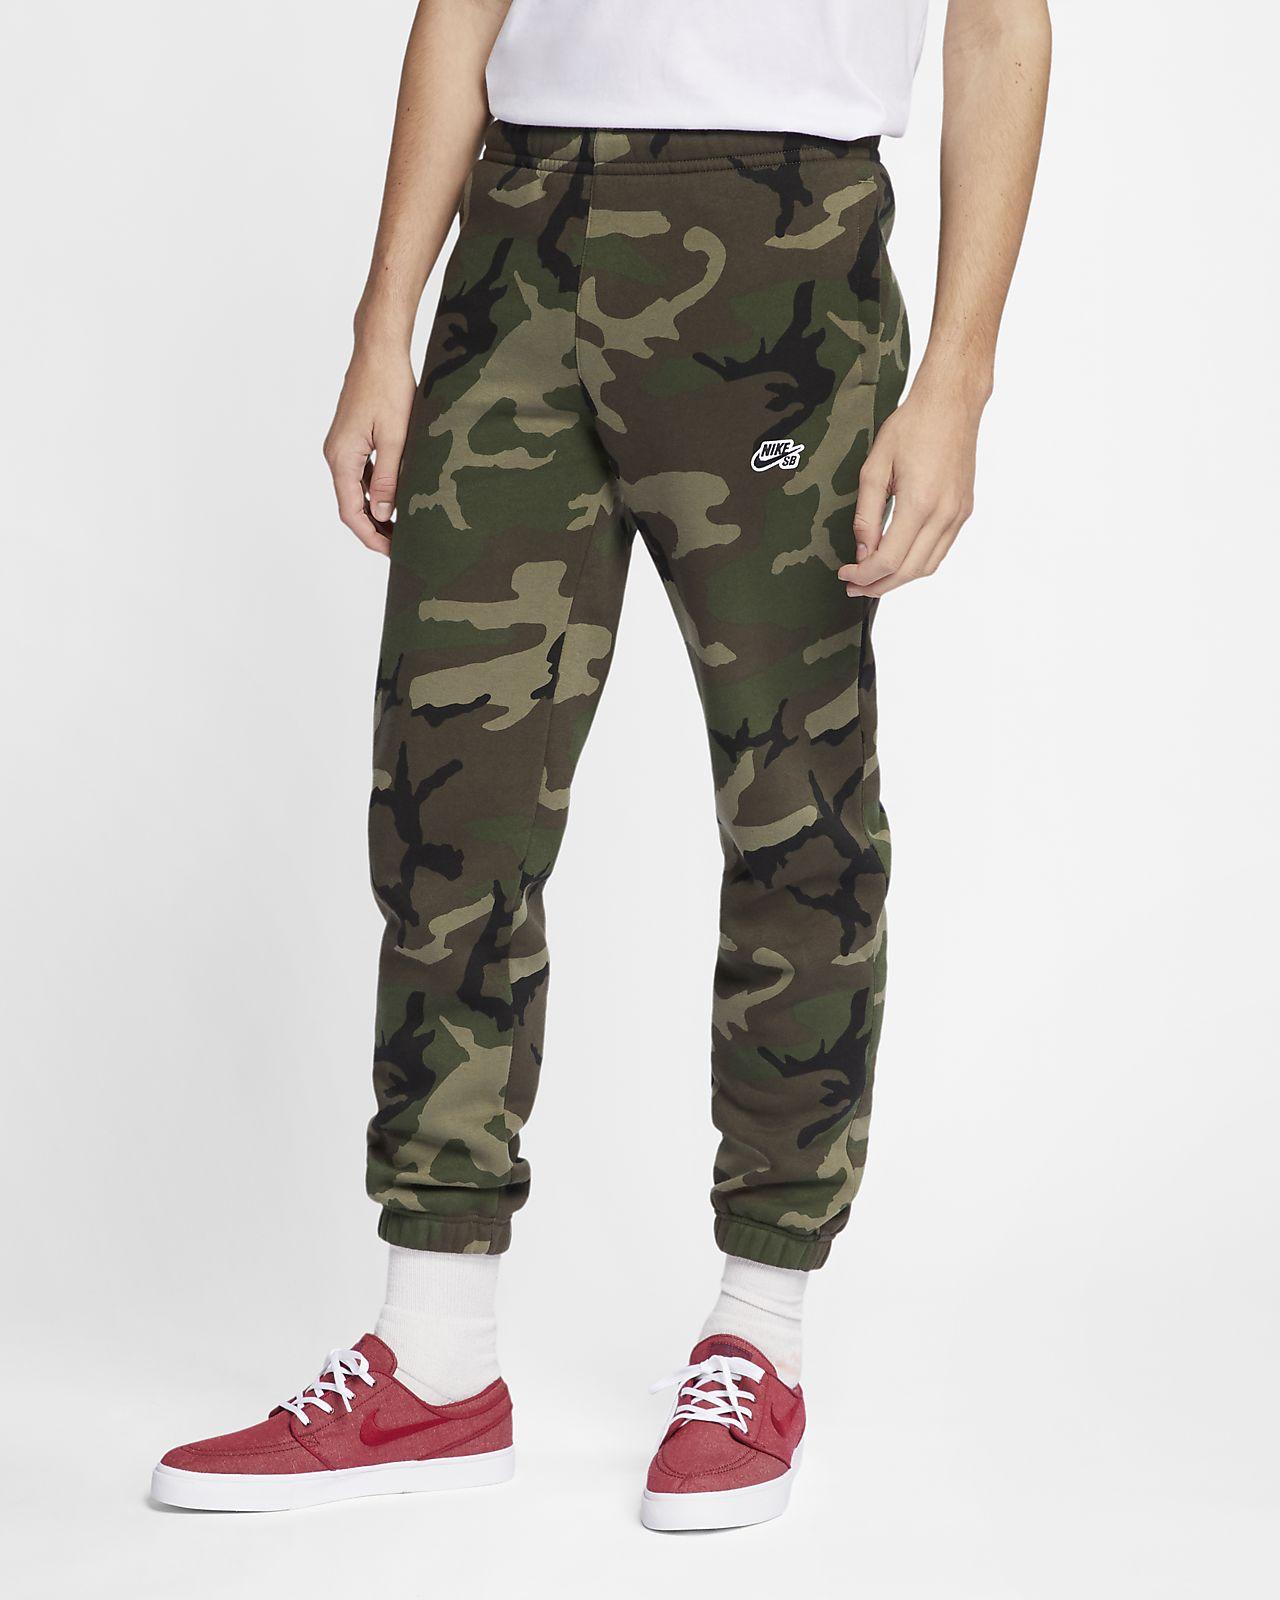 Pour Icon Sb Nike Skateboard Homme Pantalon De Camouflage wBTxYq